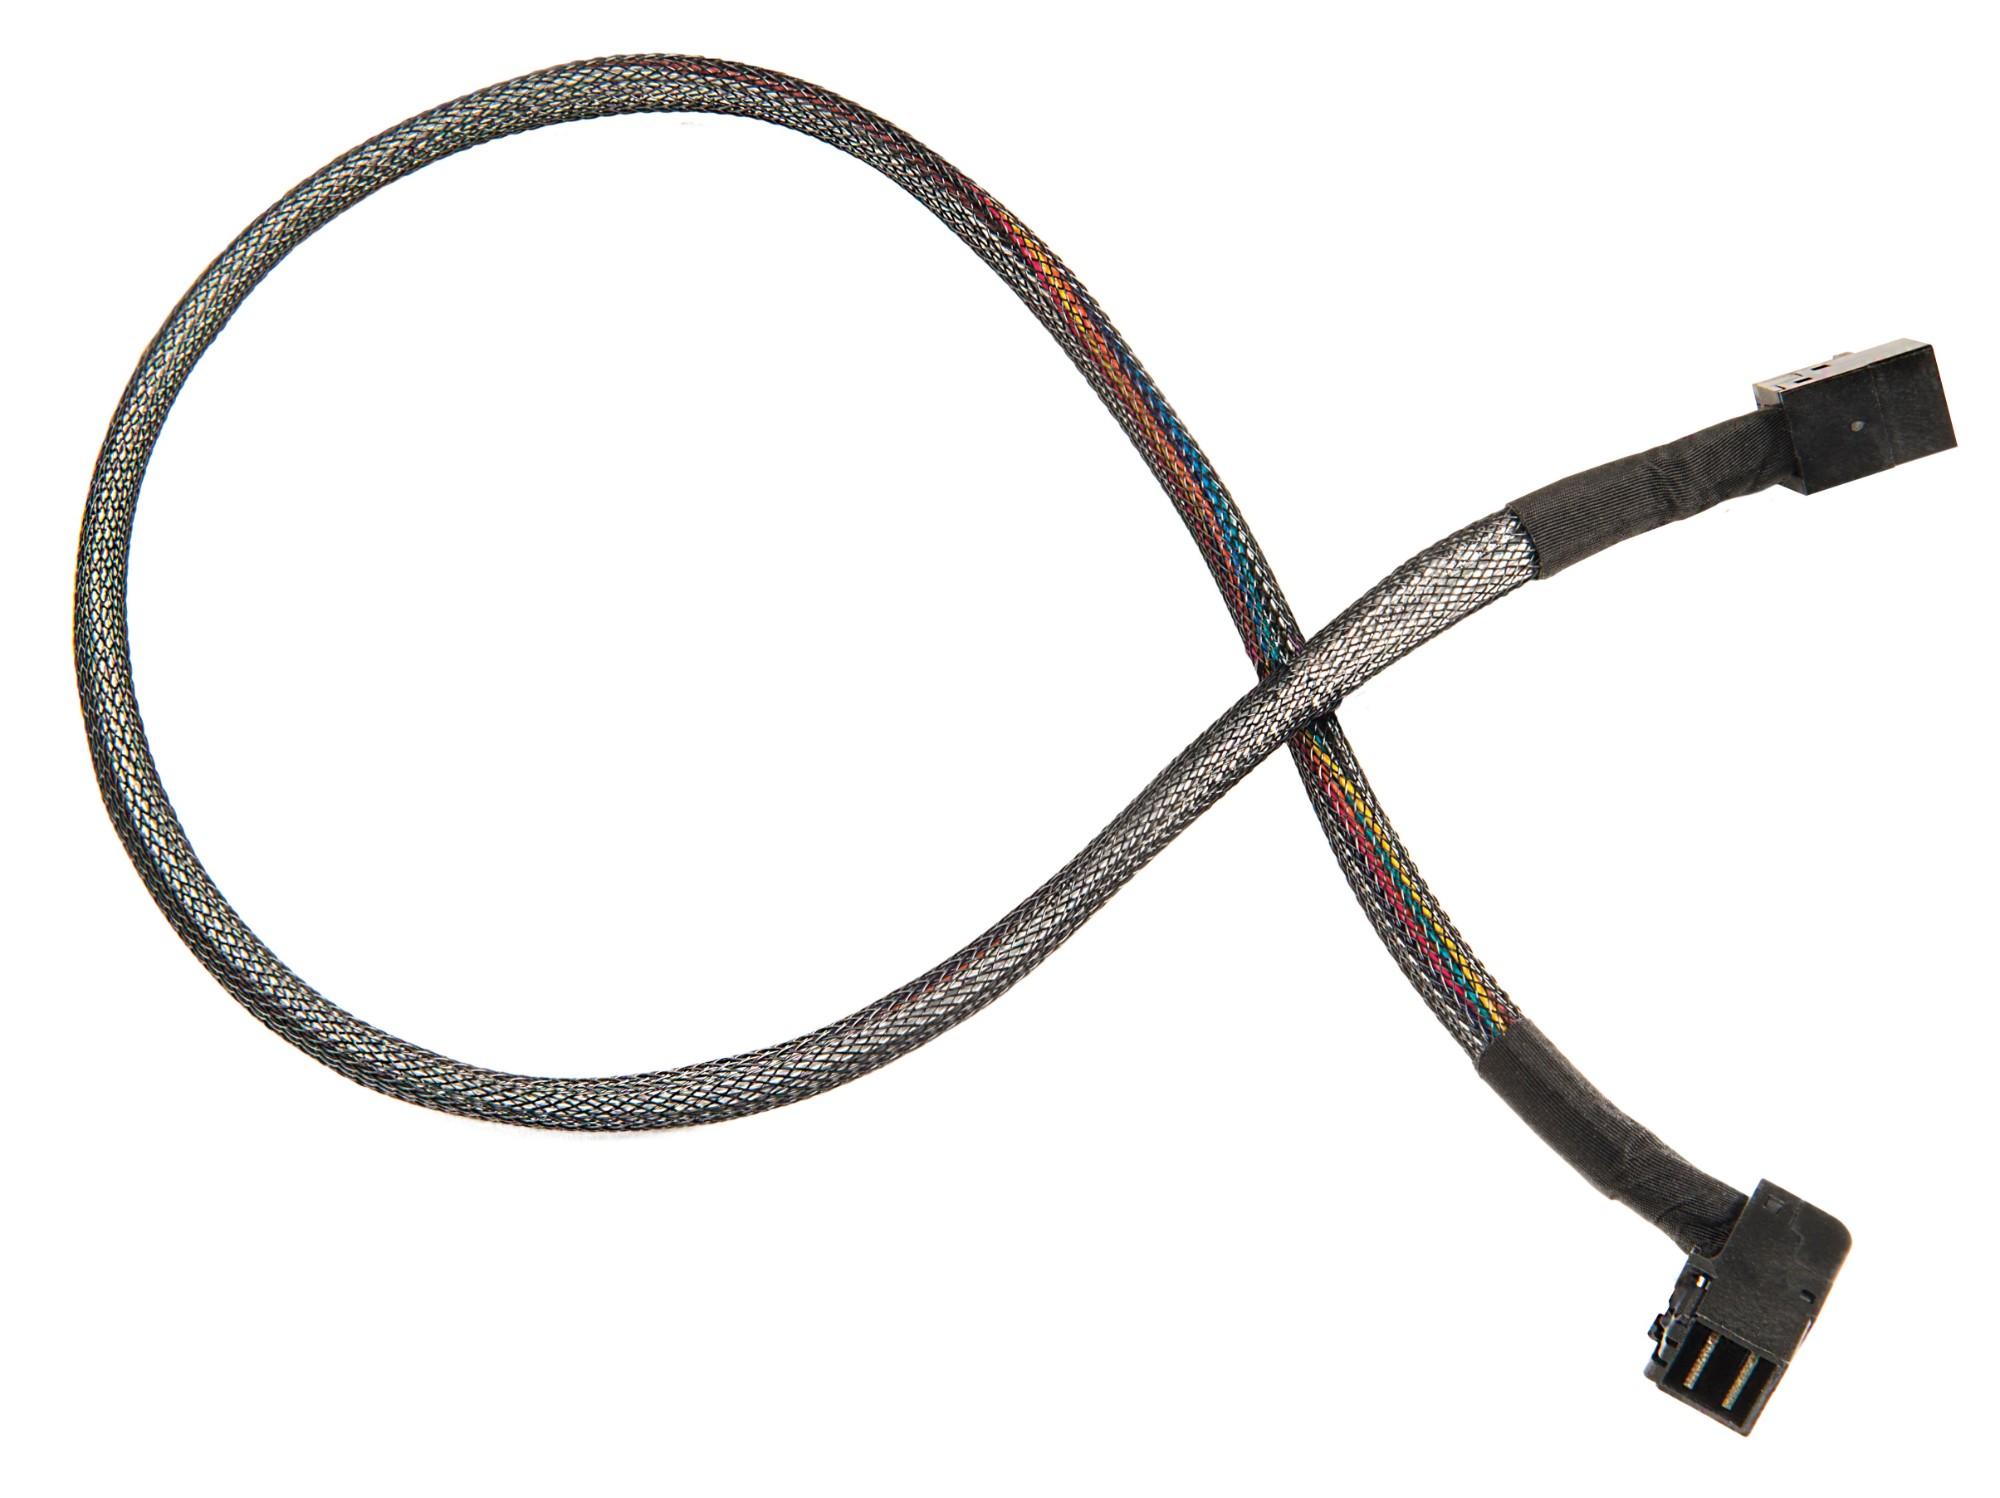 Microsemi ADAPTEC I-RA-HDMSAS-HDMSAS-1M 1m 12Gbit/s Black 2282800-R